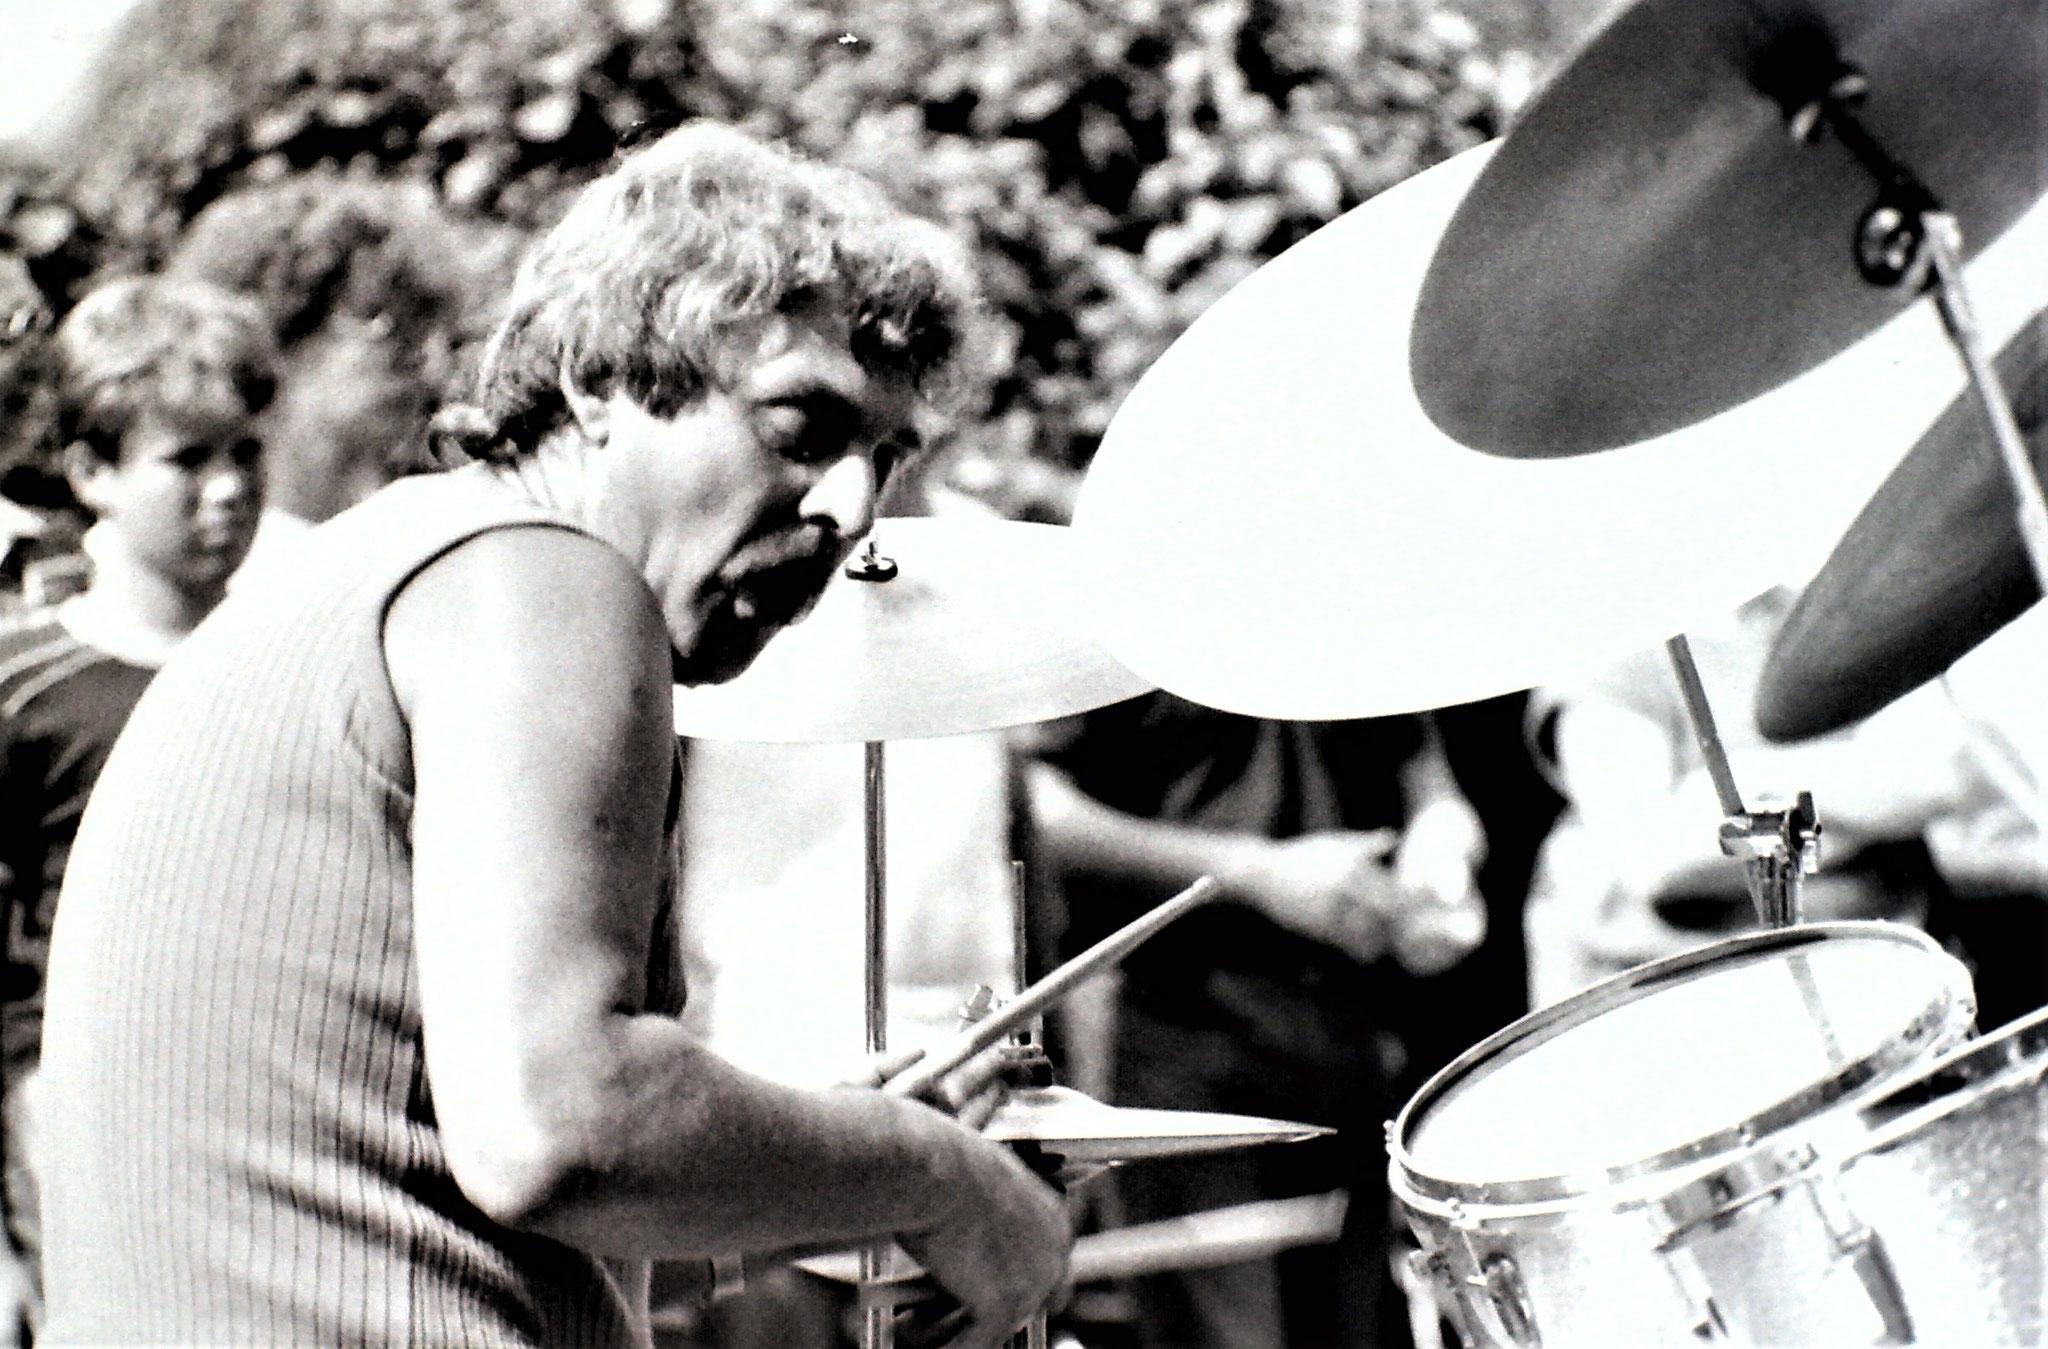 Norbert Zwicker